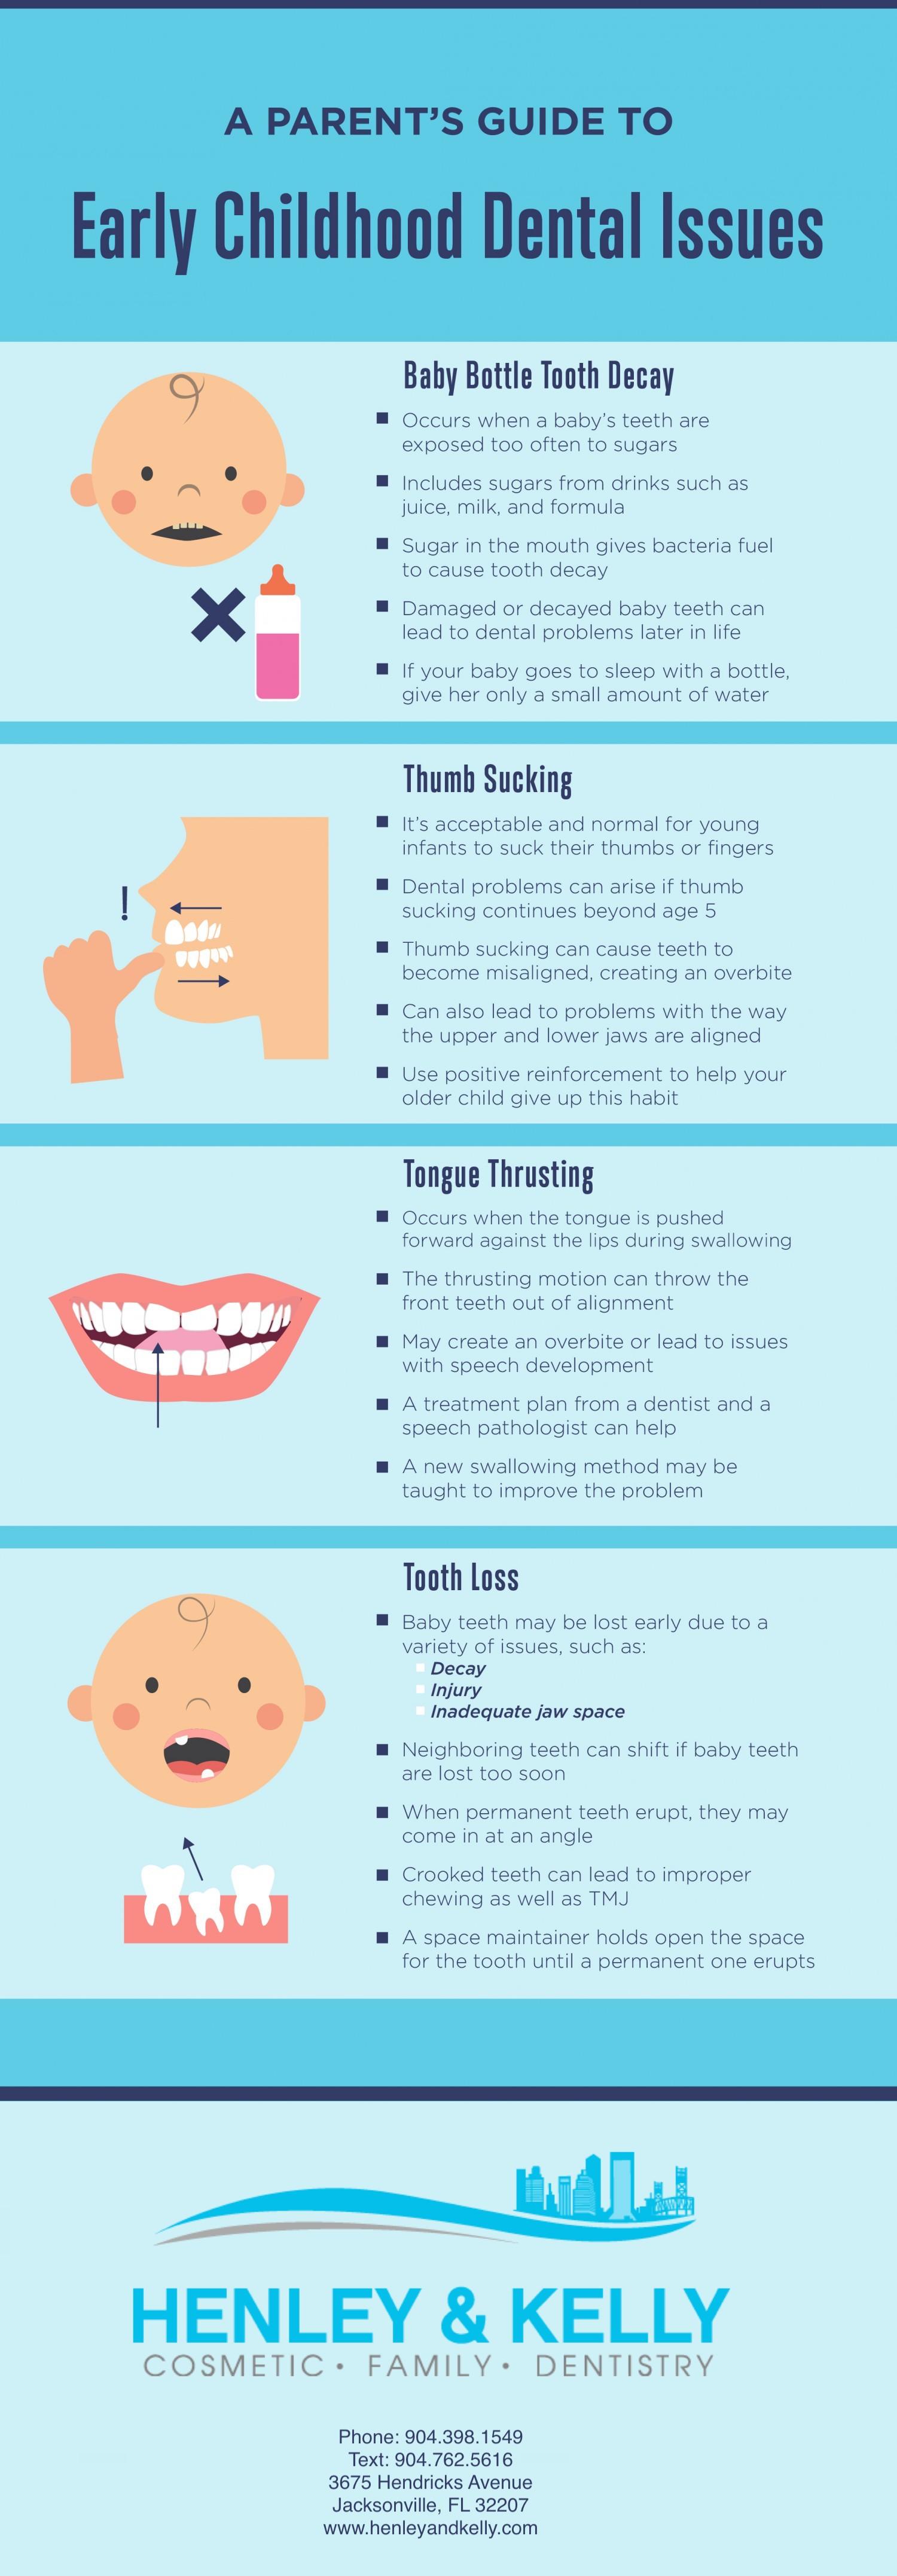 Early Childhood Dental Issues.jpg